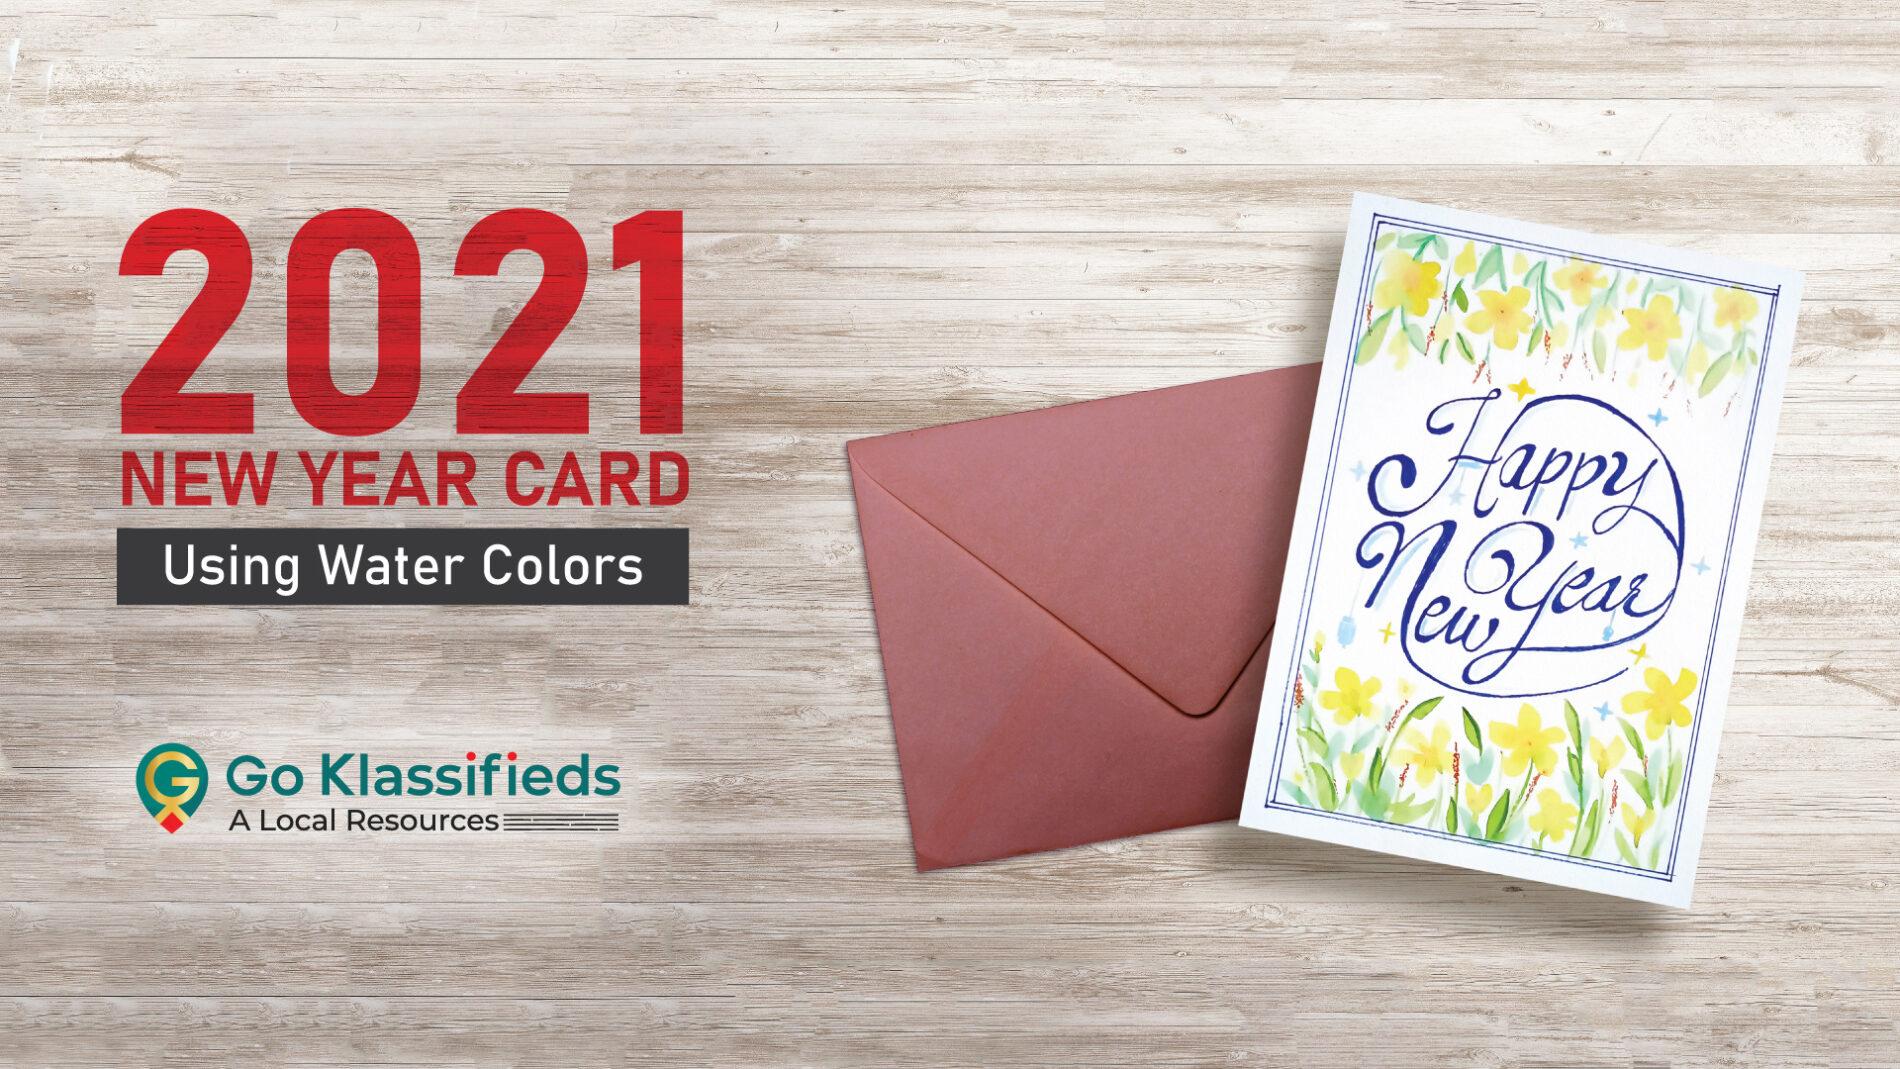 New Year Greeting Card 2021